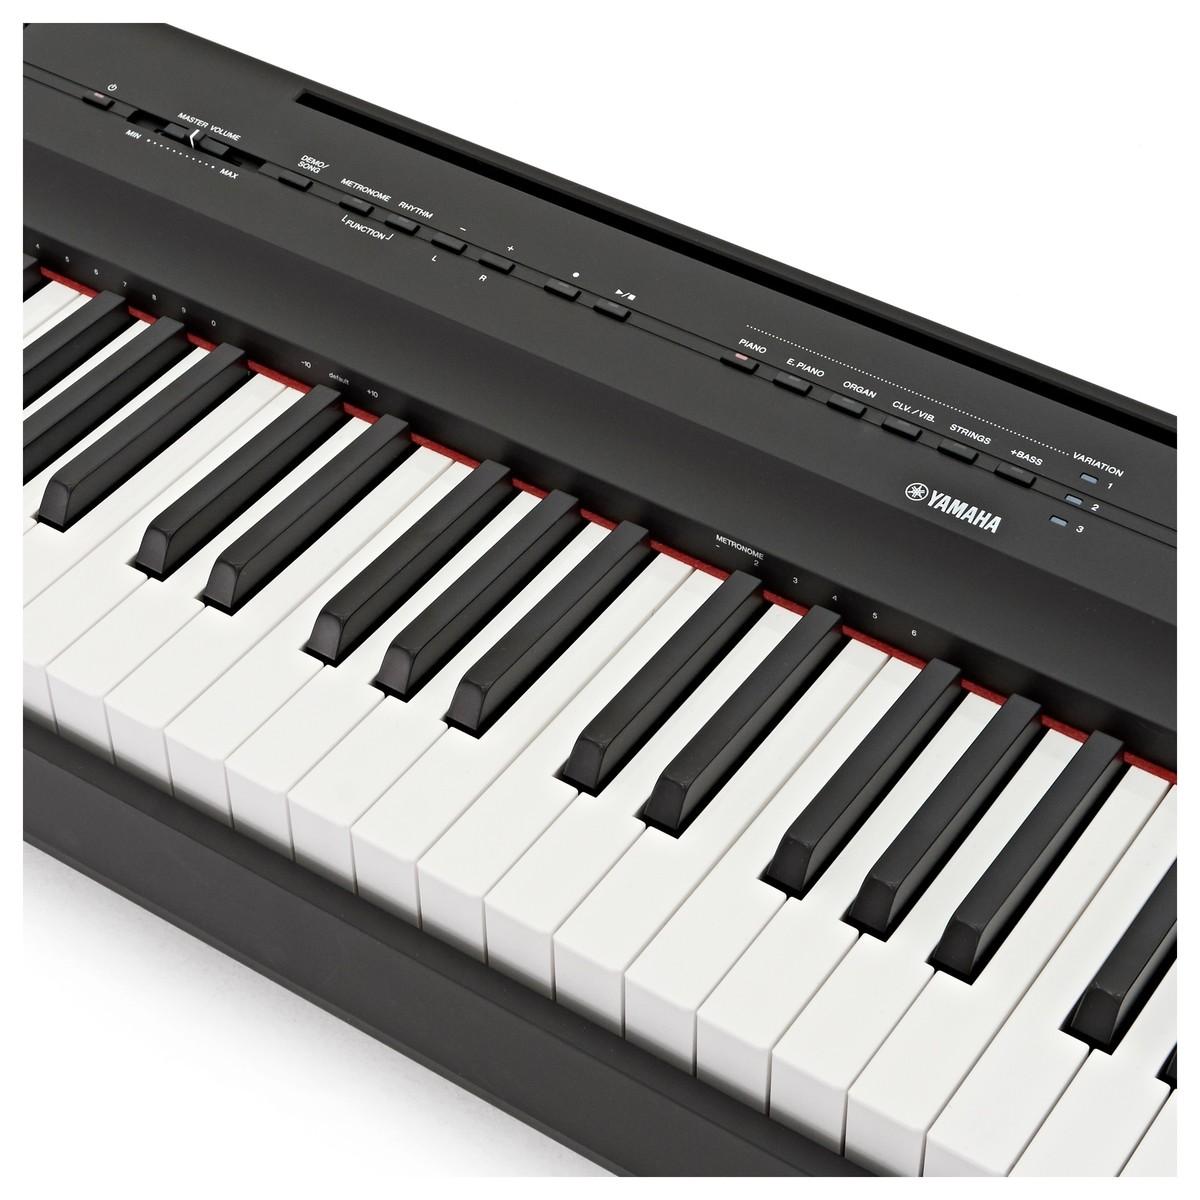 yamaha p125 digital piano black at gear4music. Black Bedroom Furniture Sets. Home Design Ideas